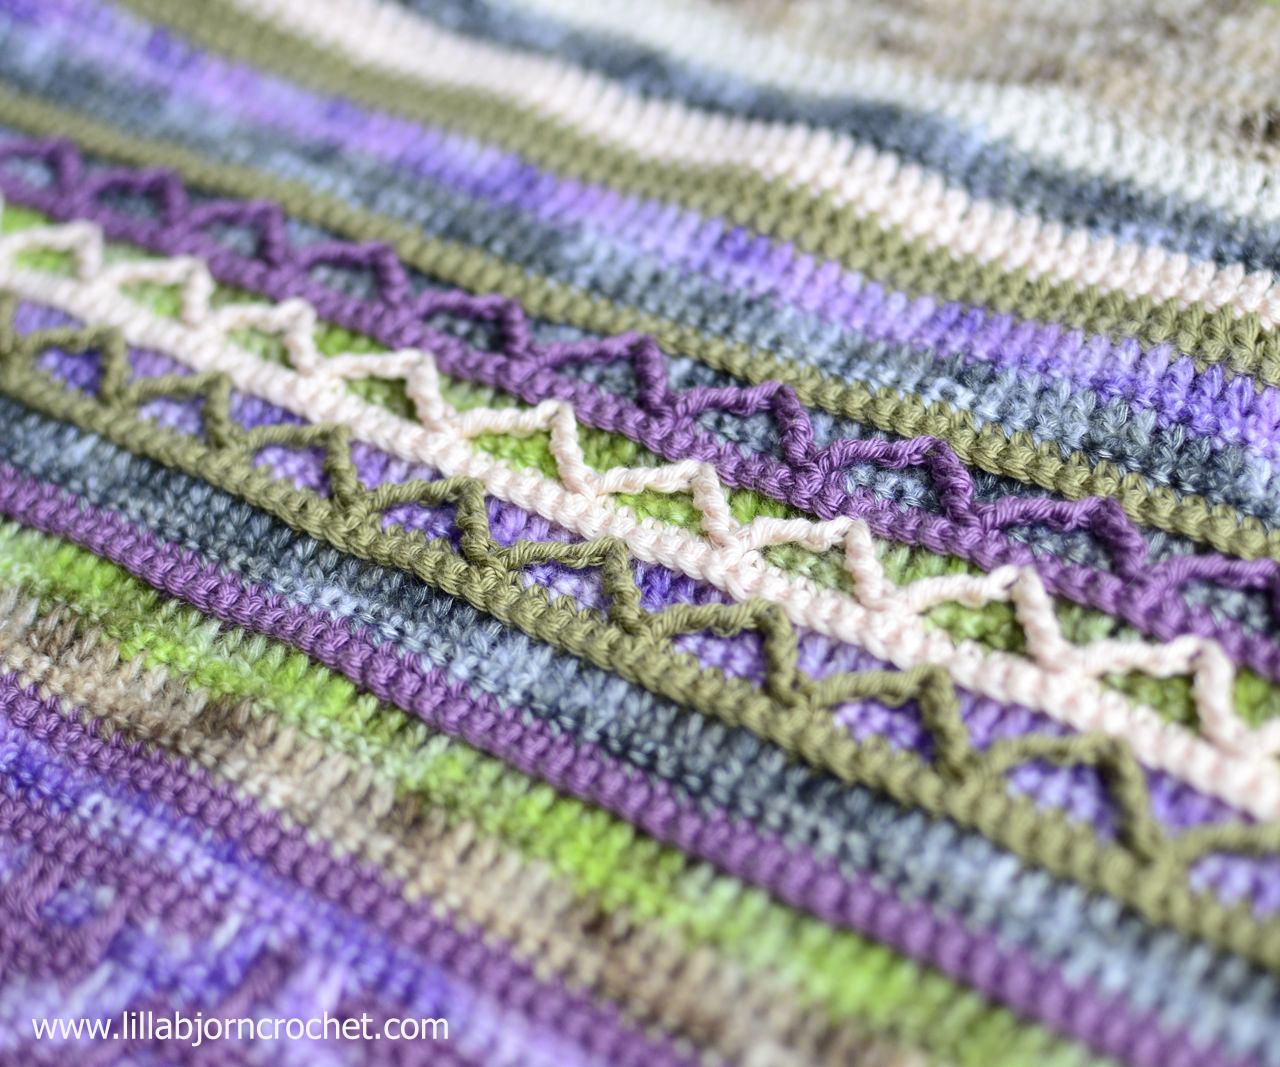 Spirits of Life CAL by www.lillabjorncrochet.com. Free crochet wrap pattern